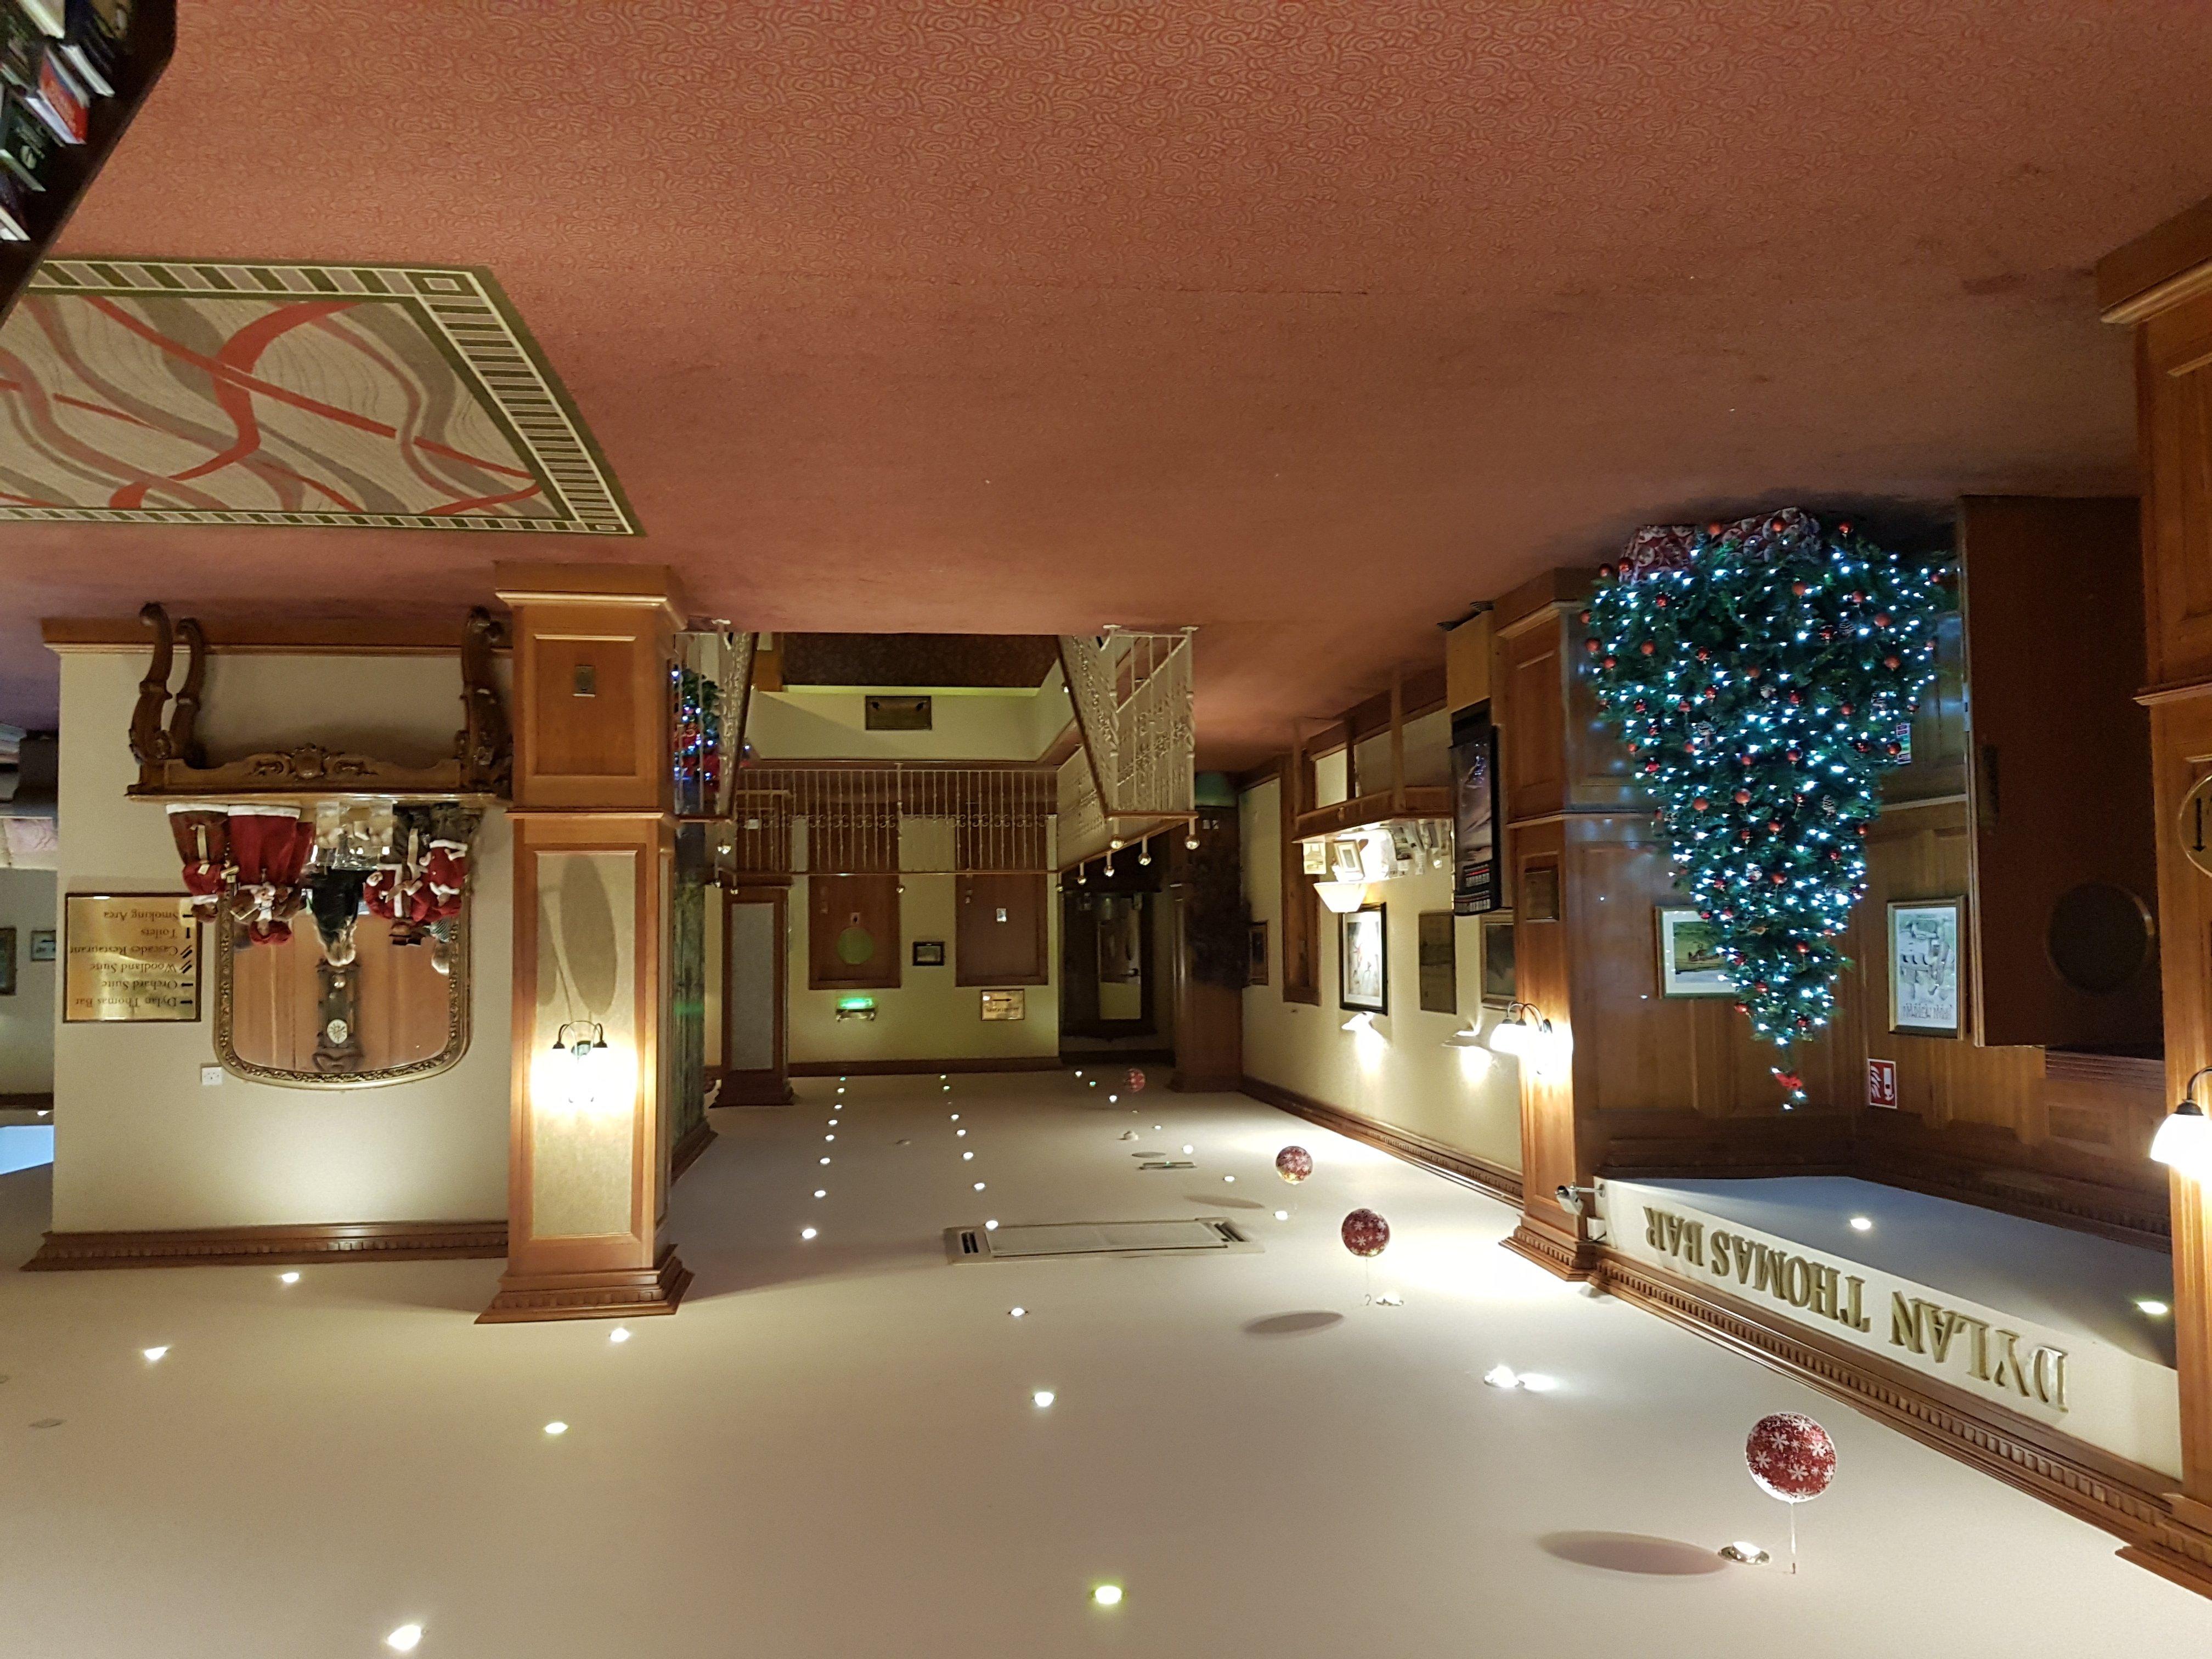 Falls Hotel & Spa